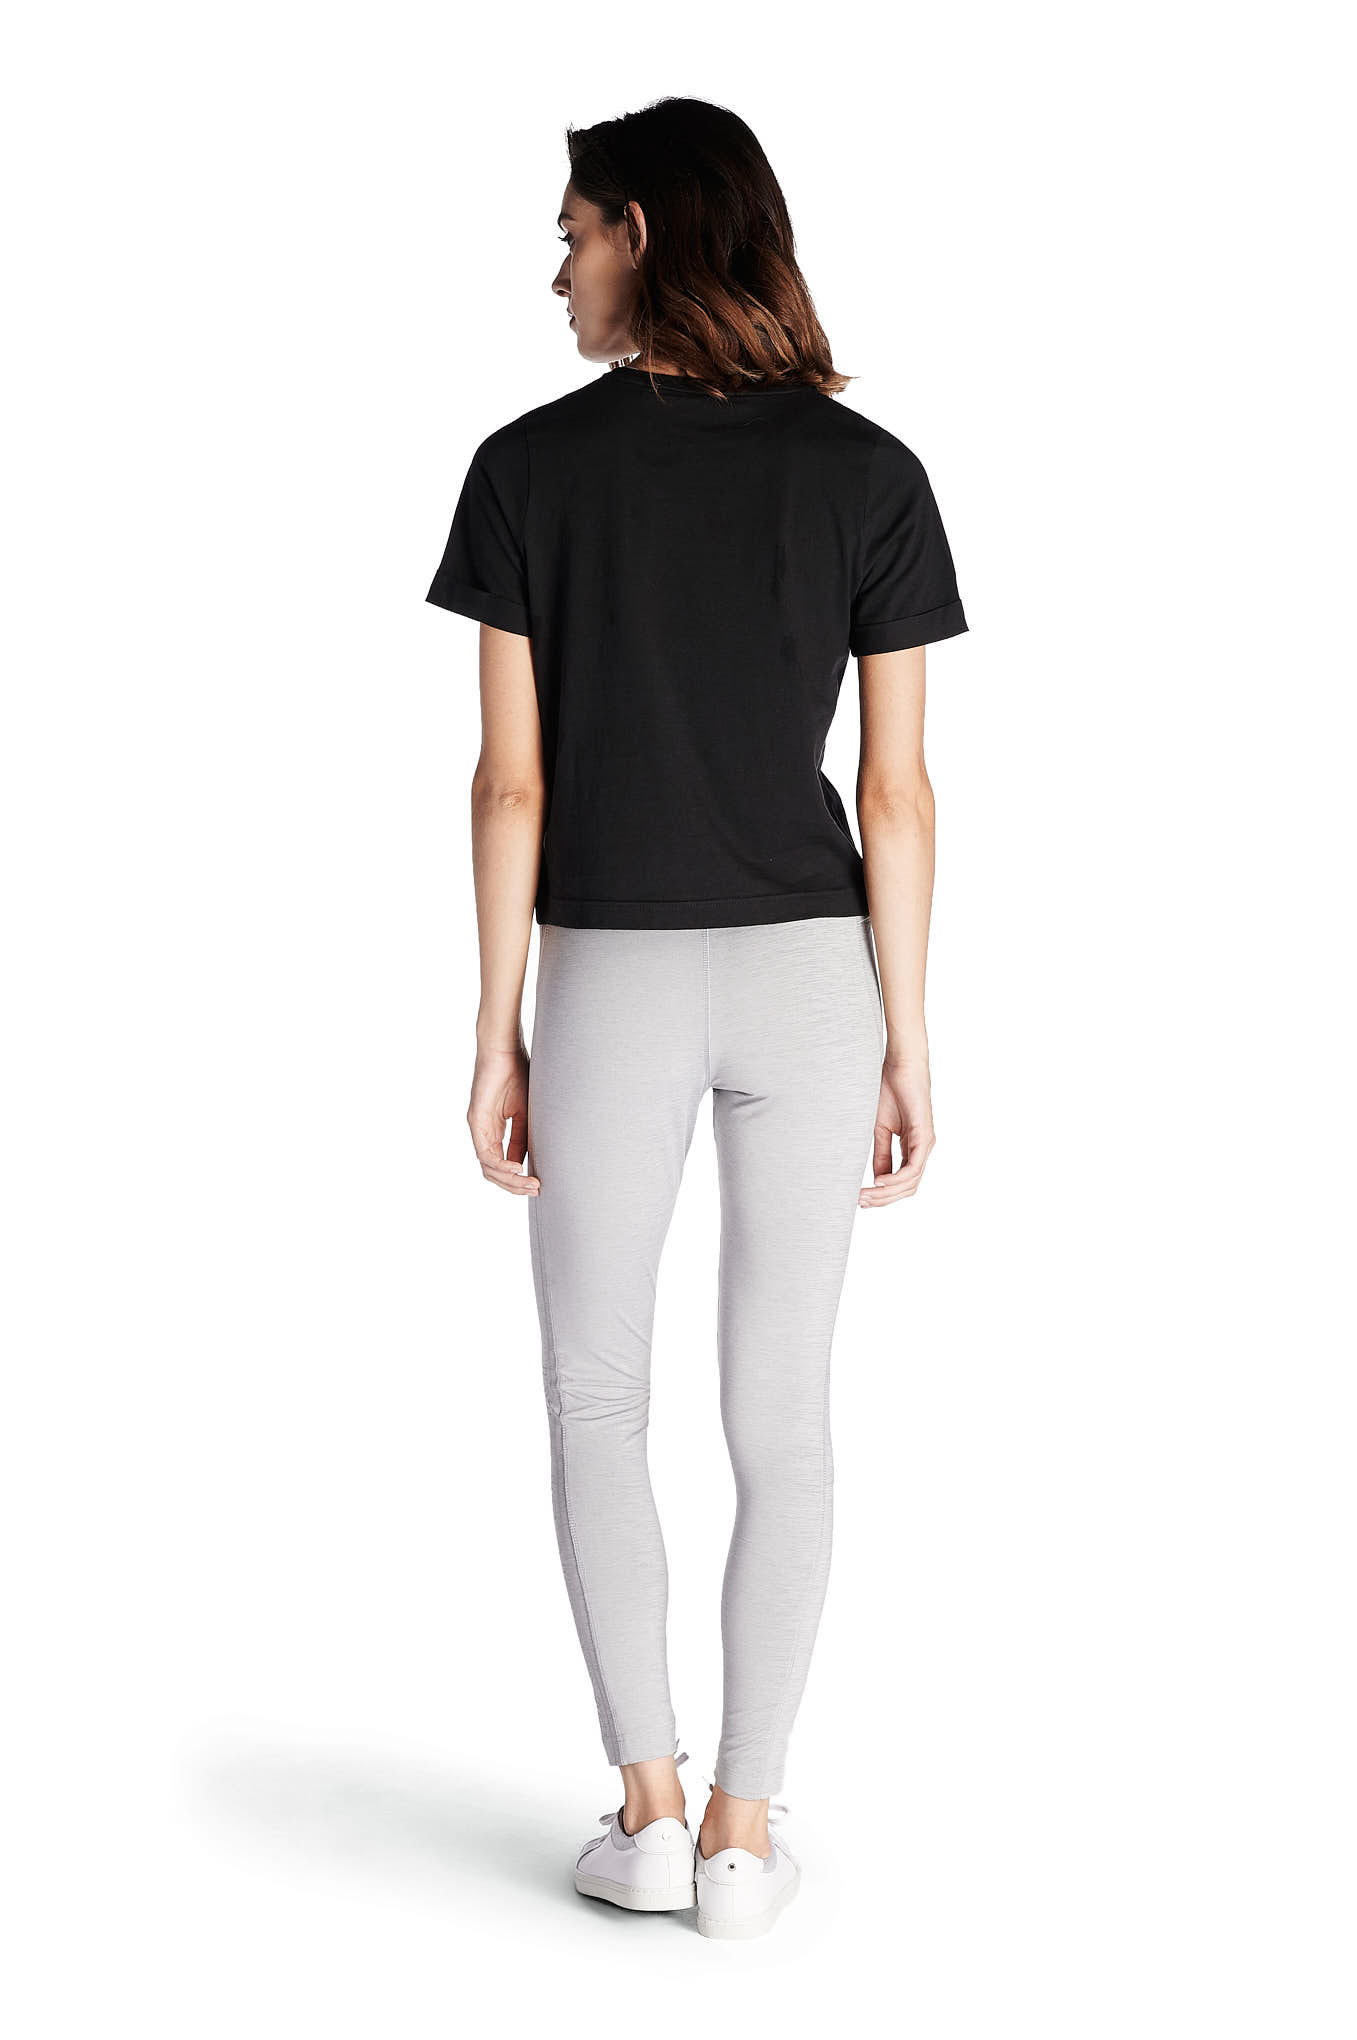 T-Shirt Preto Sport Mulher